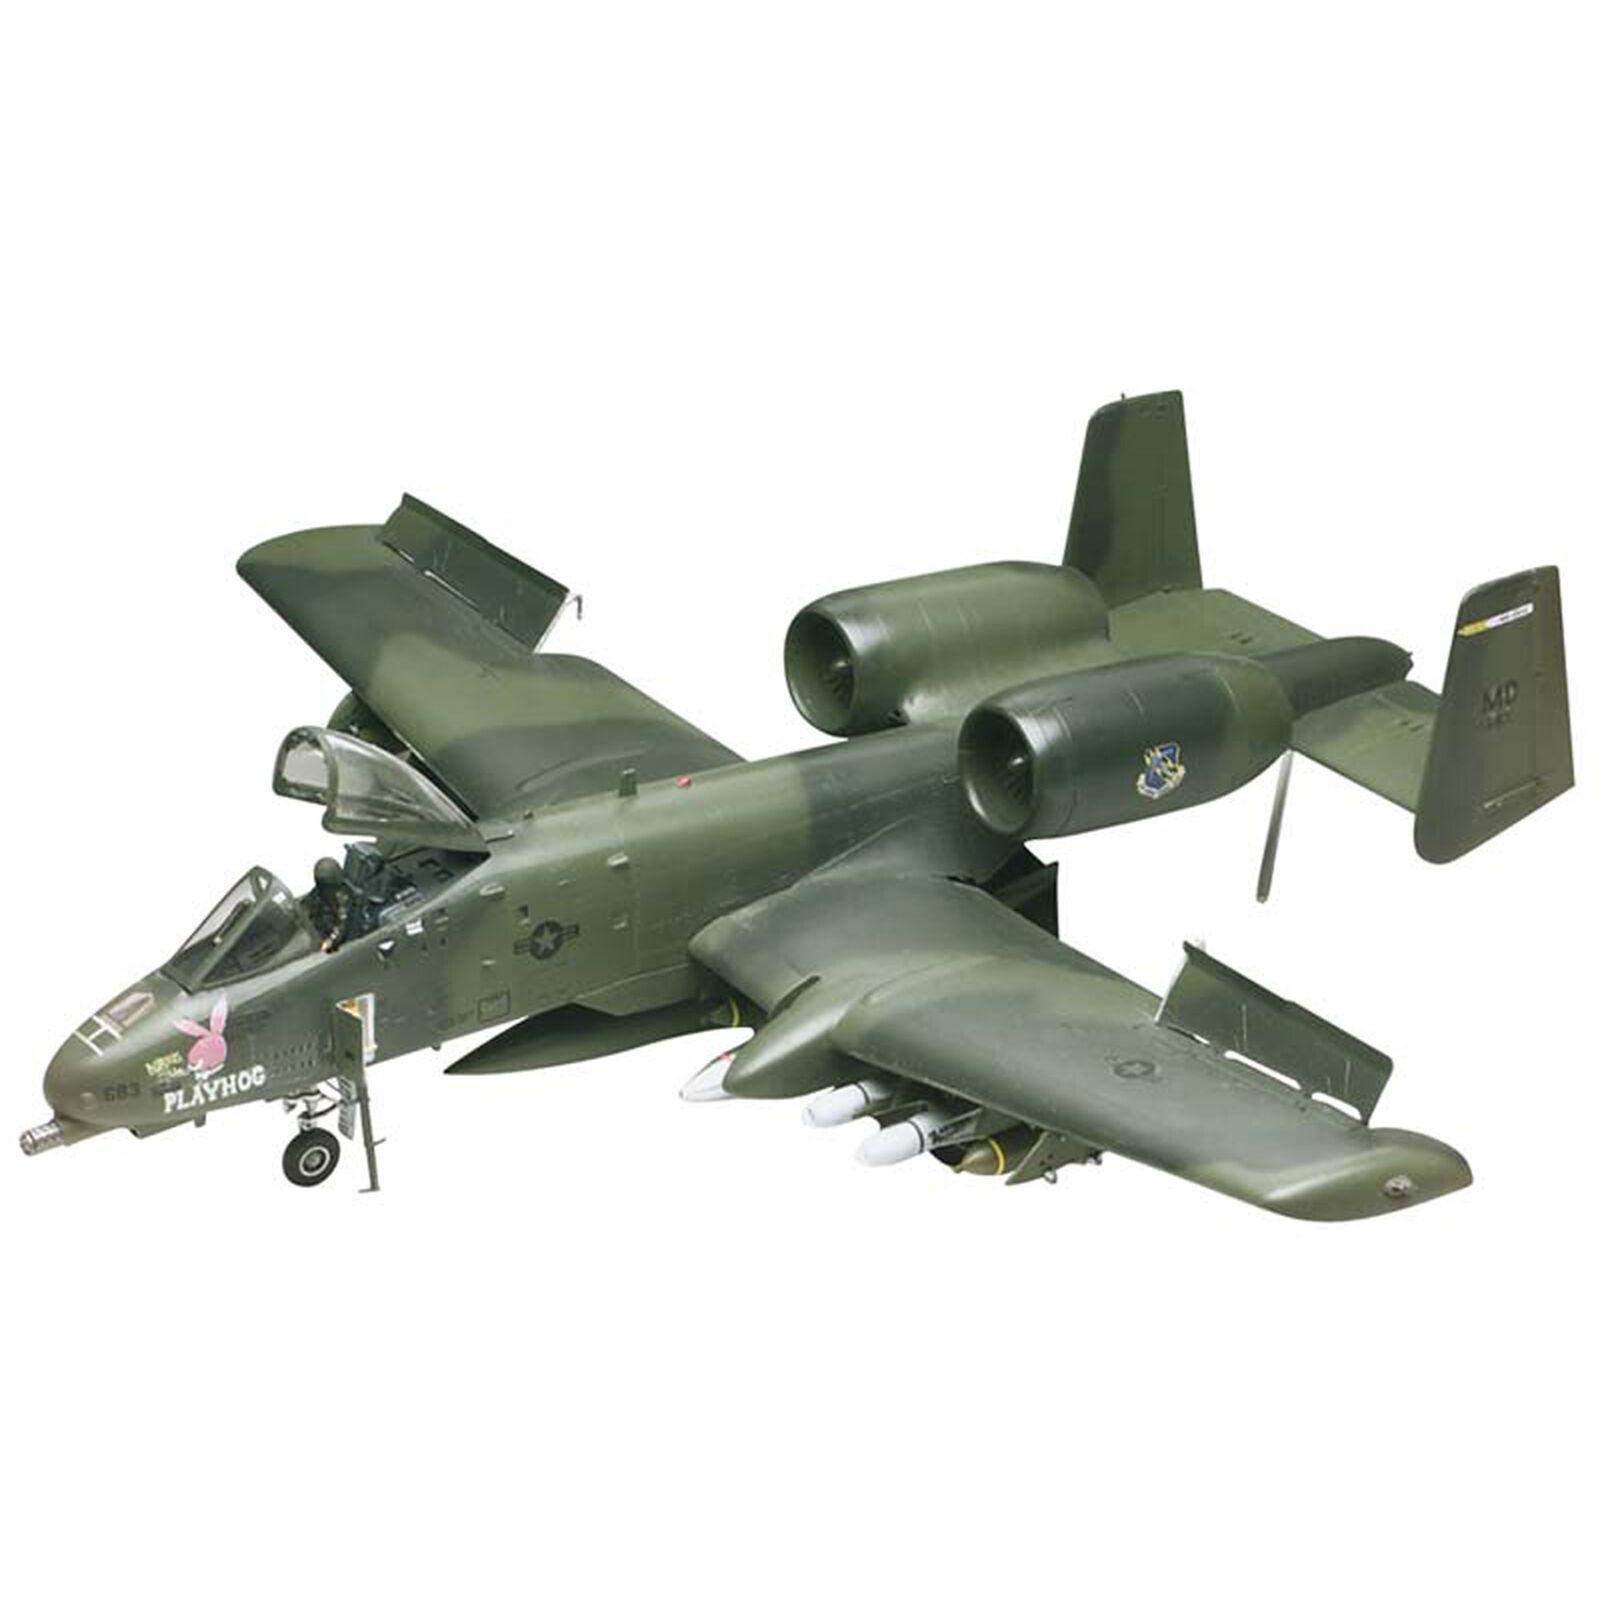 1/48 A-10 Warthog